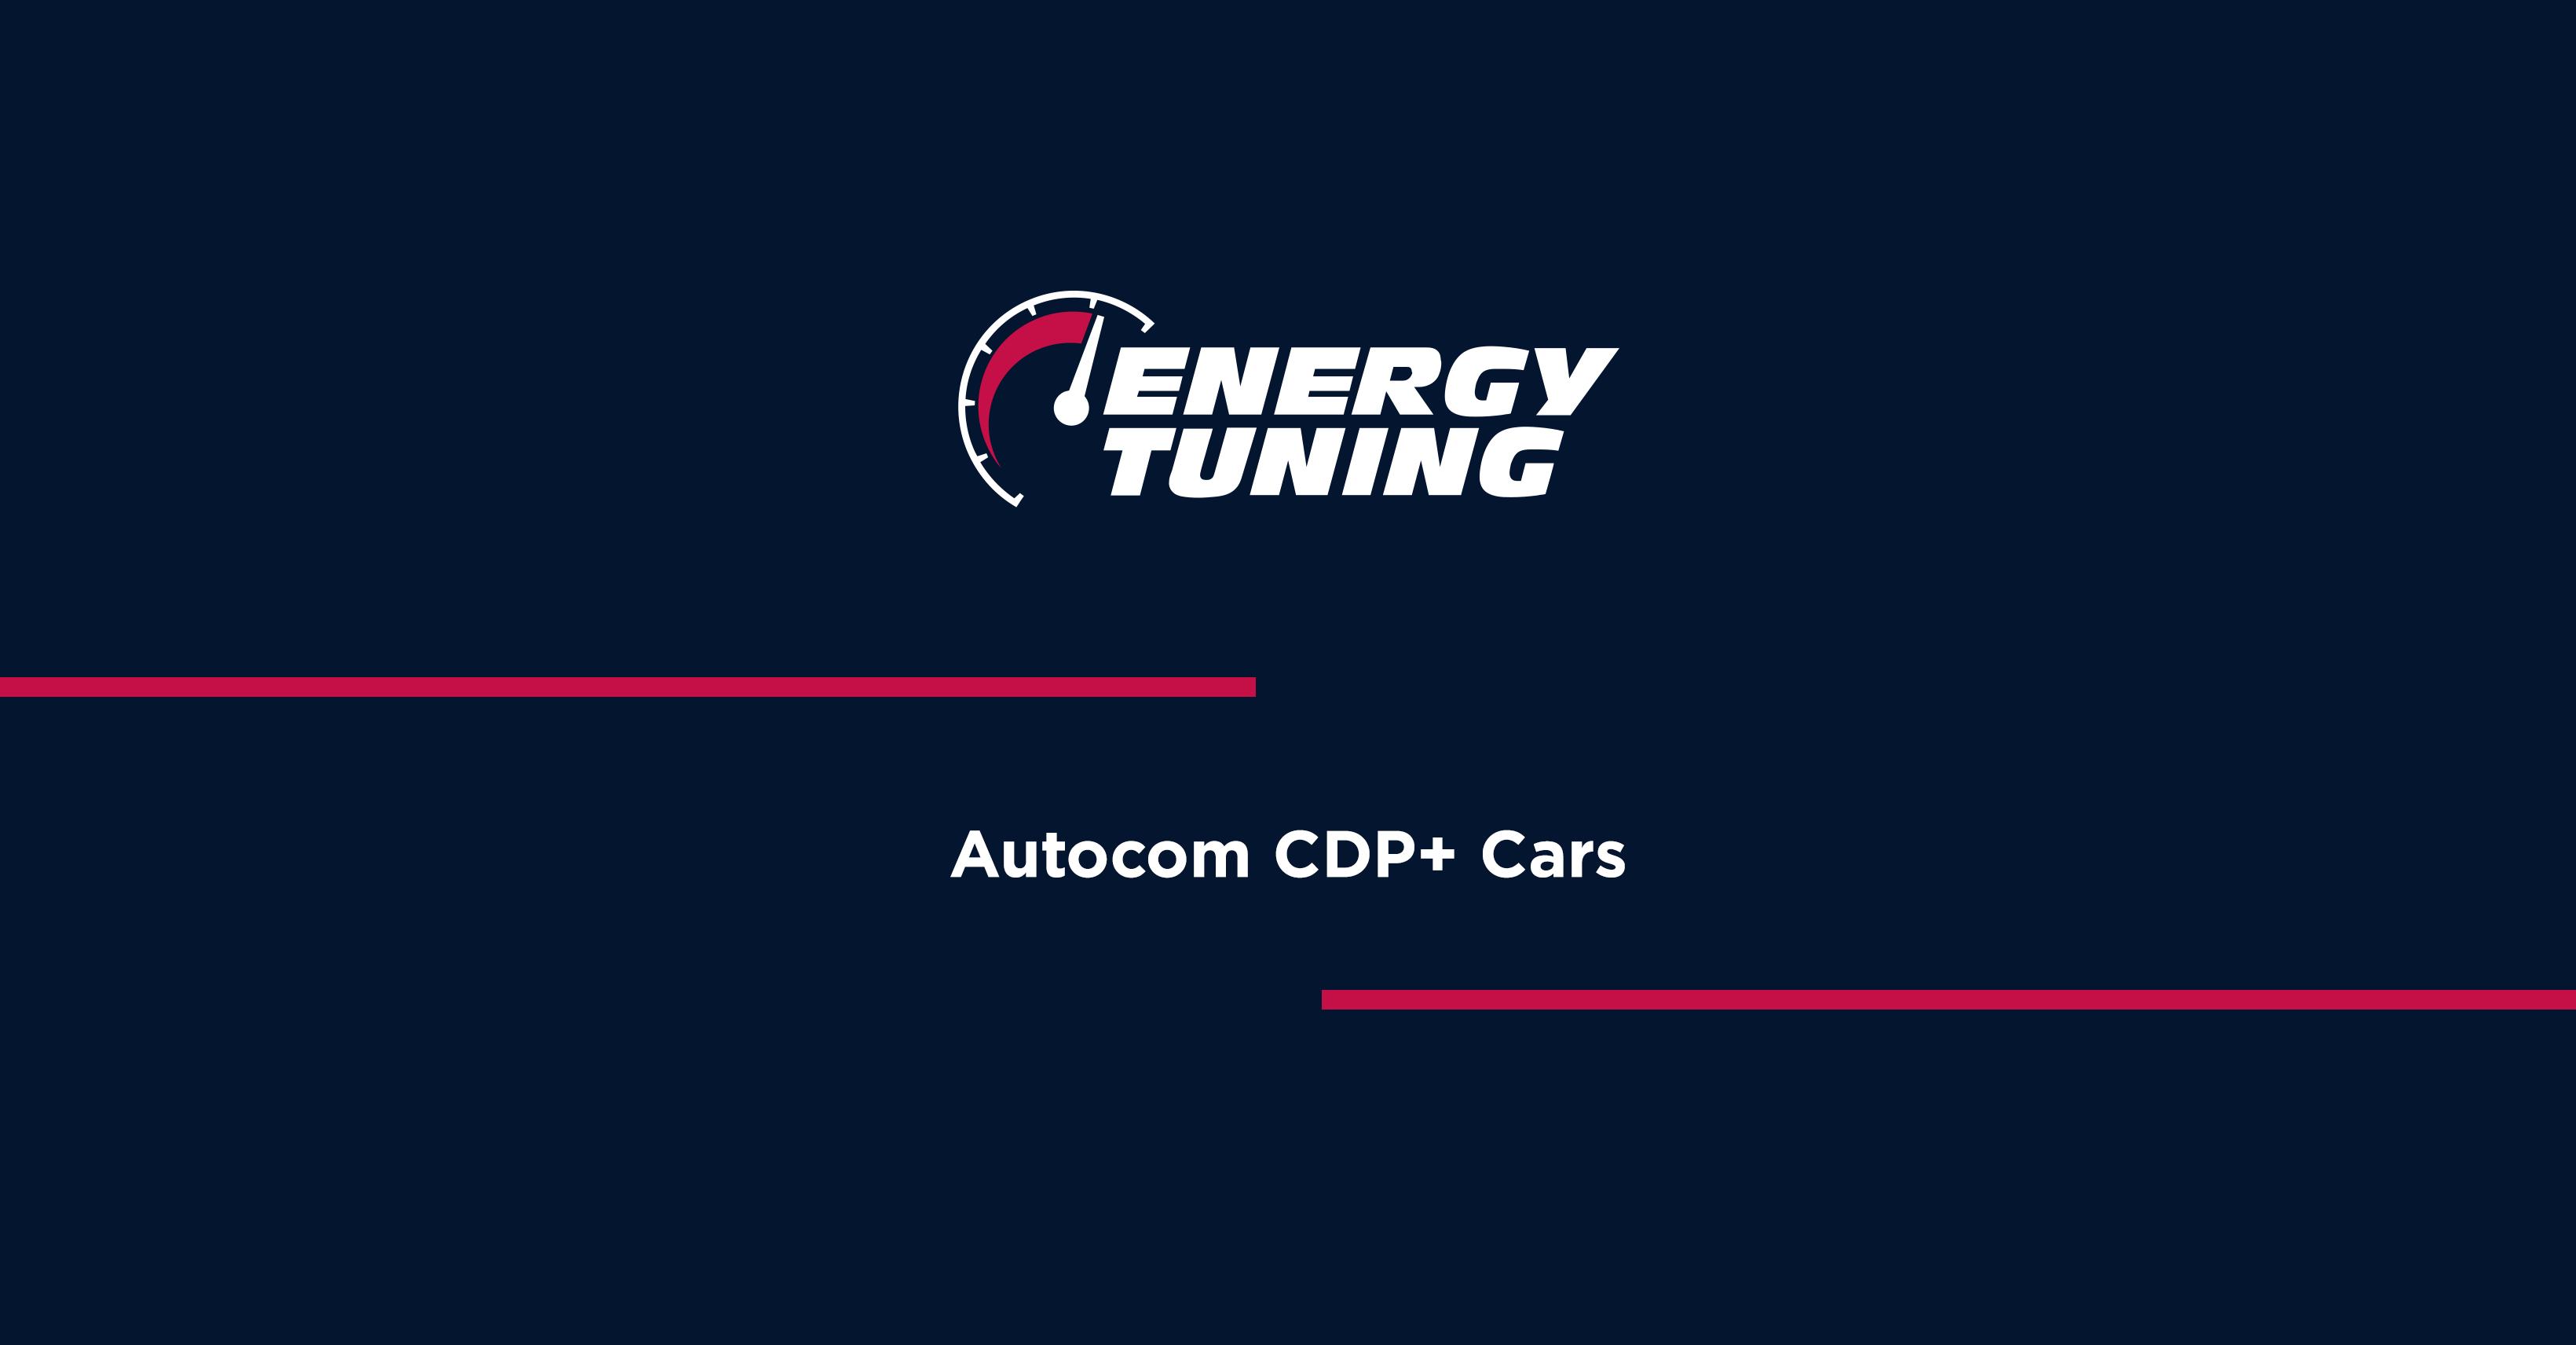 Autocom CDP+ Cars Order Online